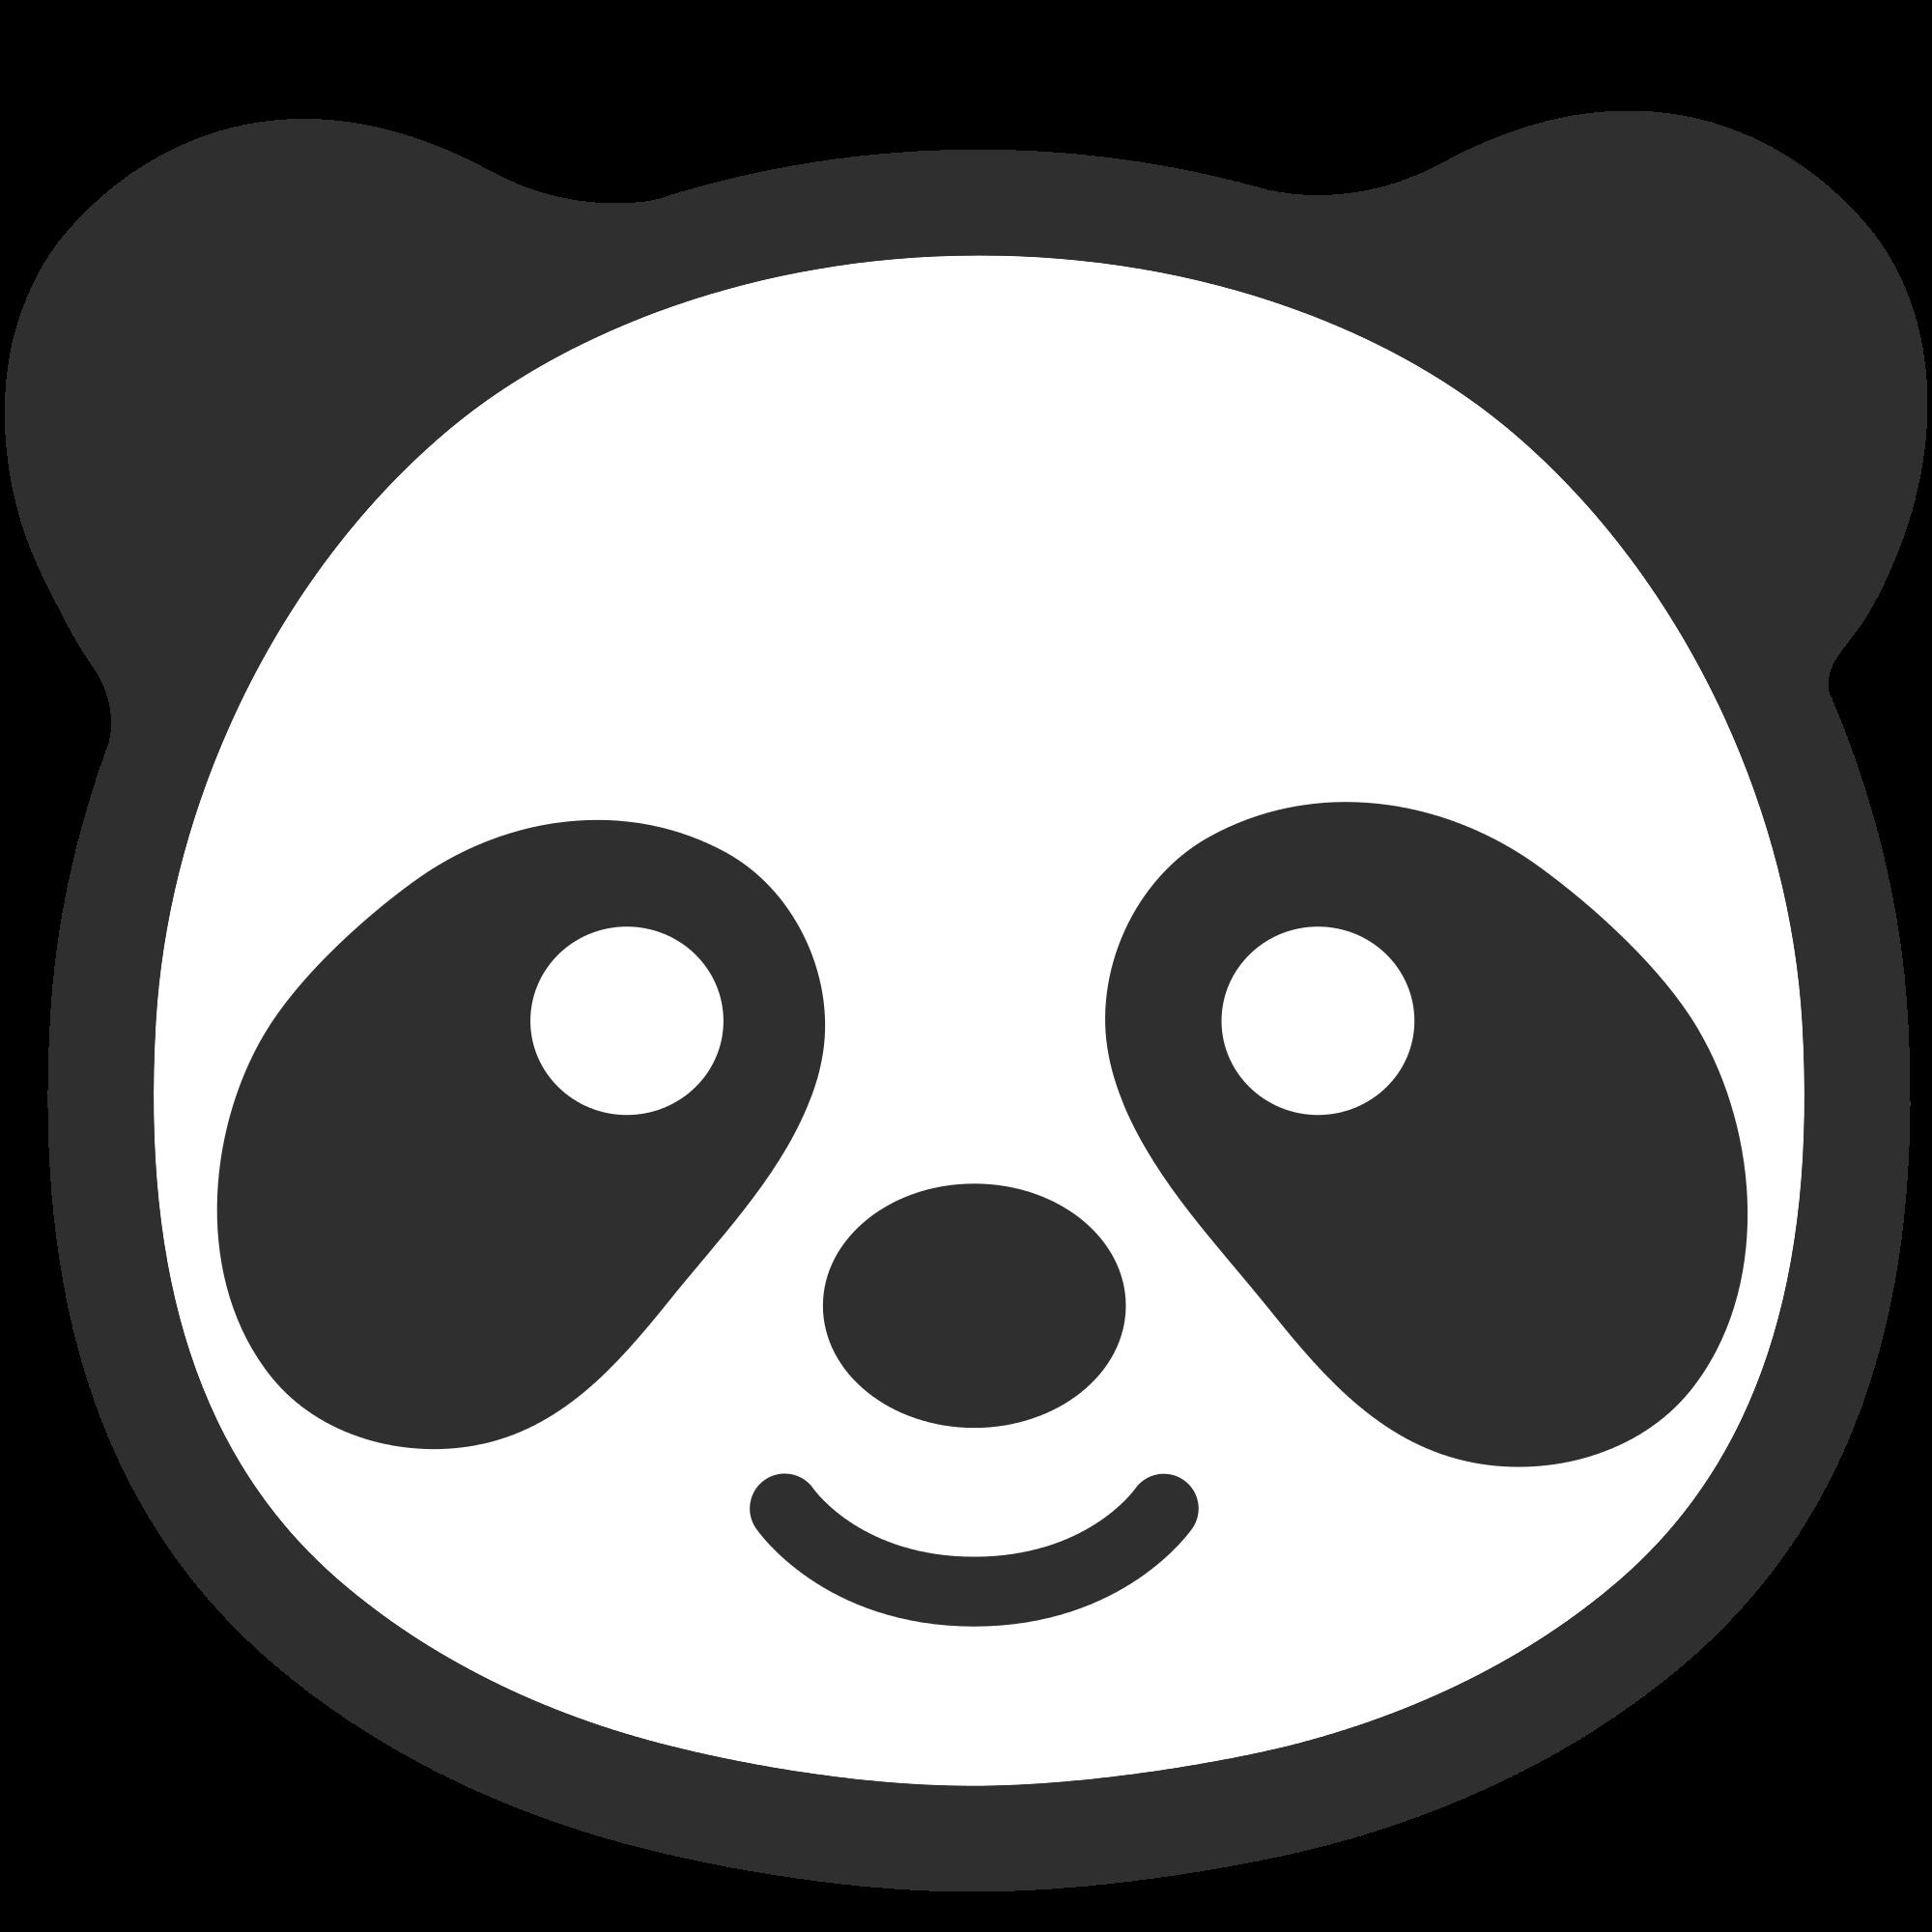 Panda transparent png stickpng. Emoji clipart coloring